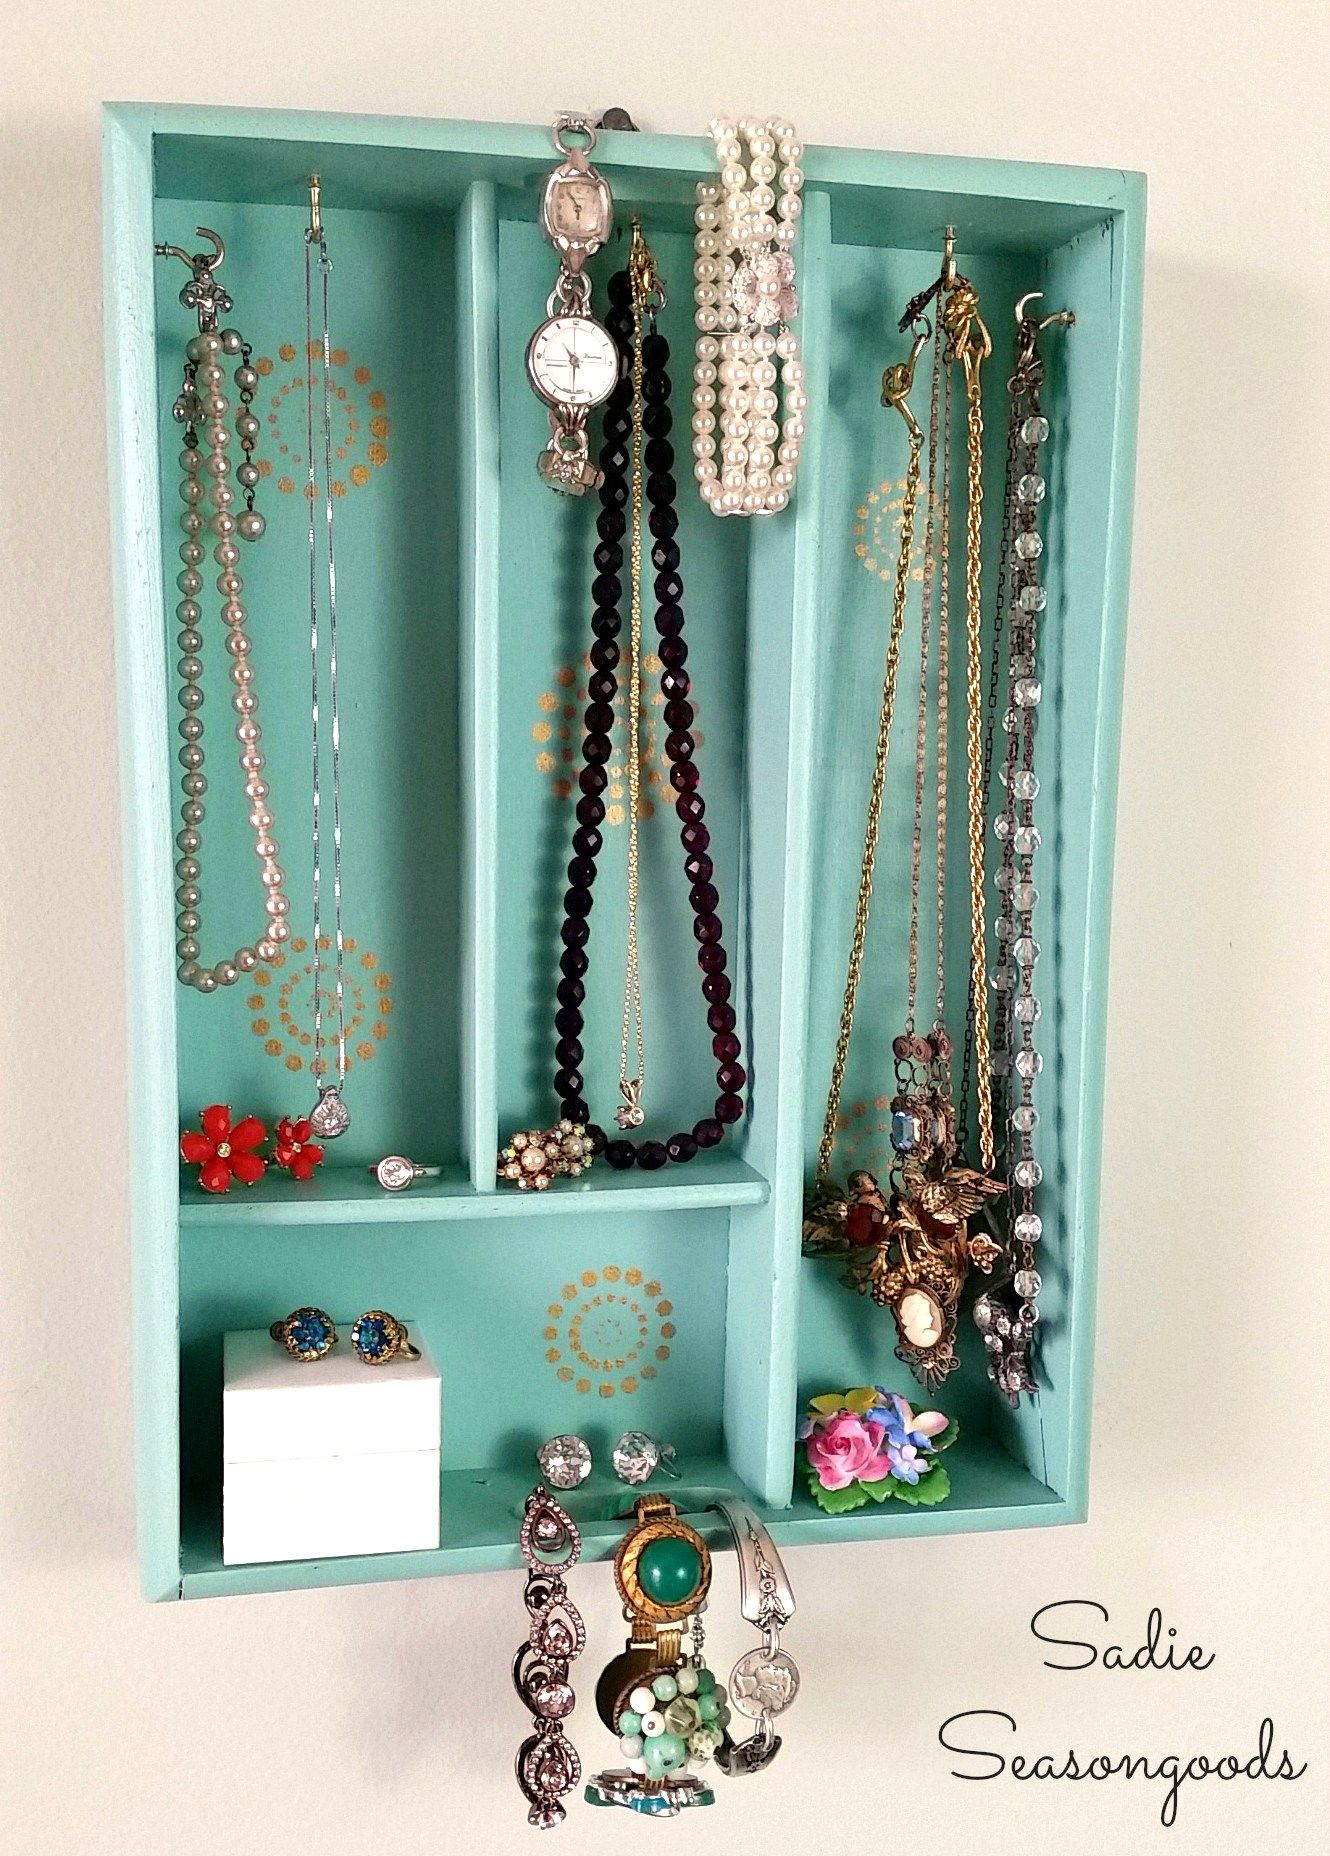 DIY Bathroom Organizer Ideas - Upcycle a silverware tray into a pretty hanging jewelry organizer - Tutorial via Sadie Seasongoods